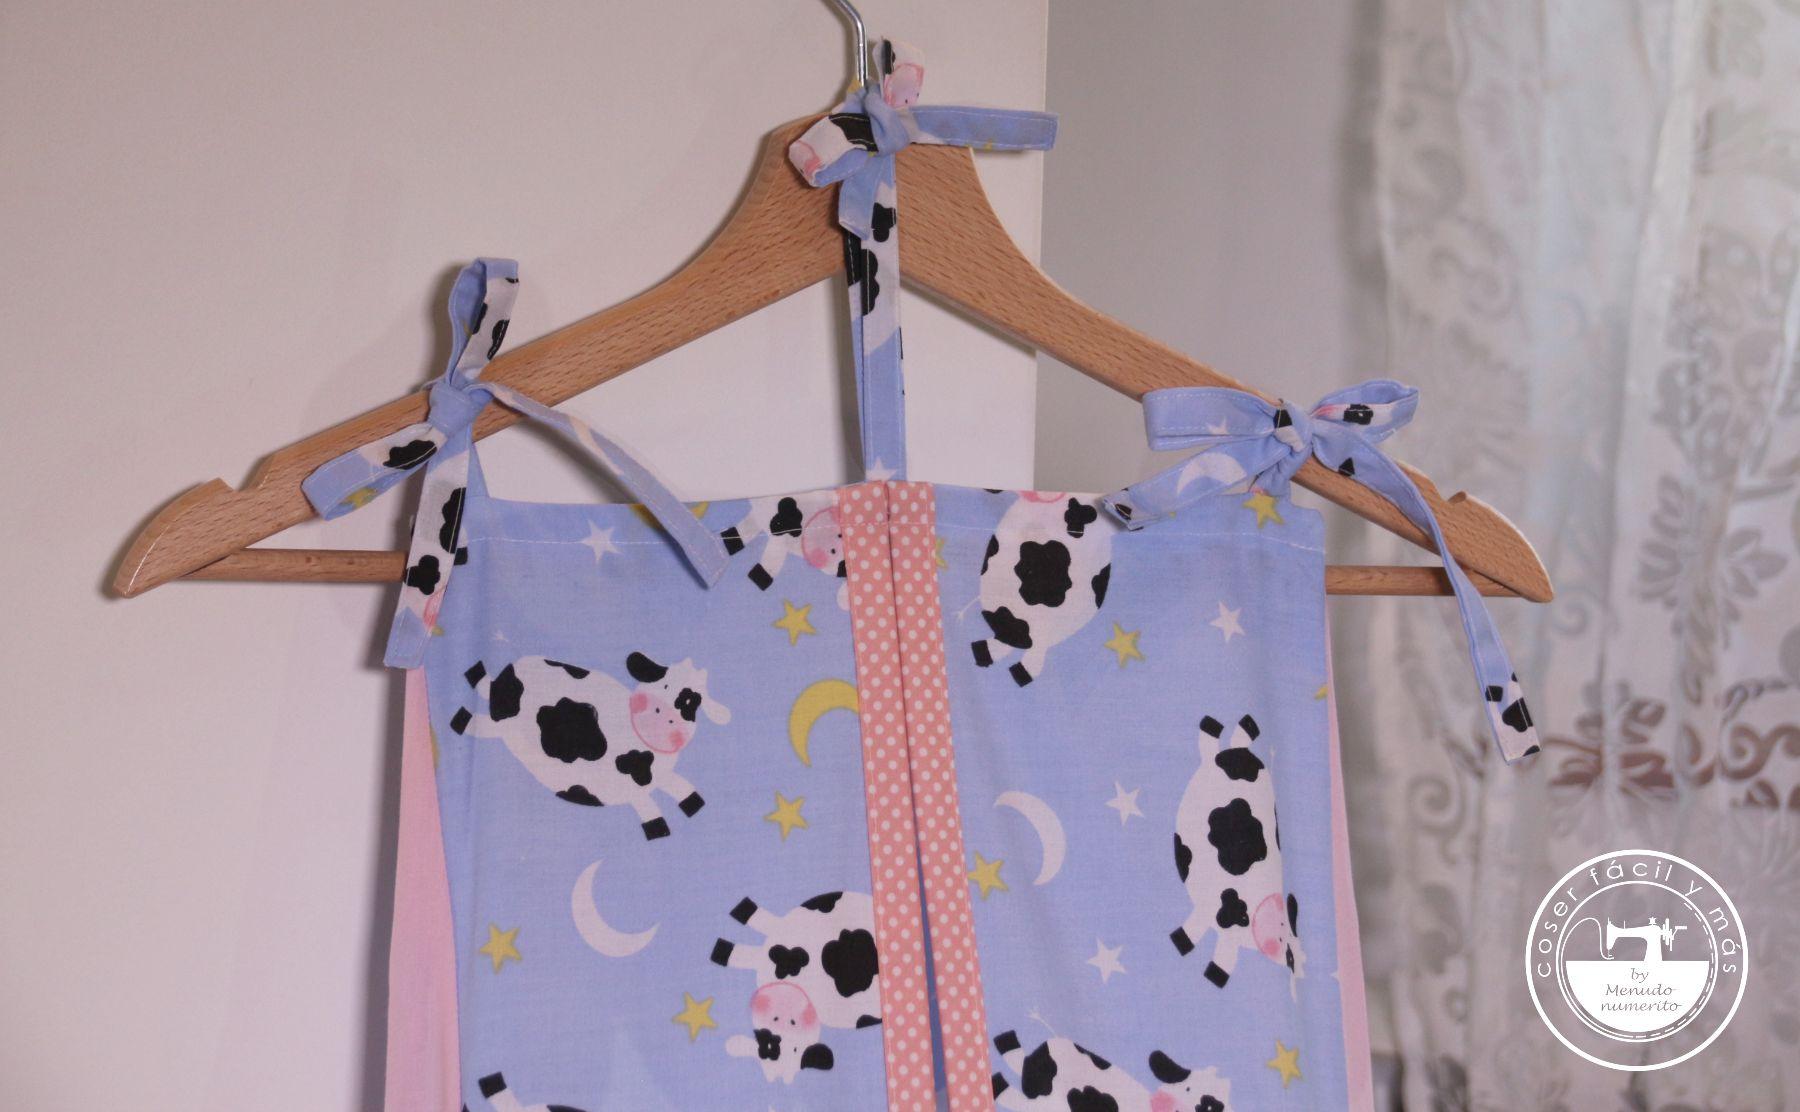 pañalera coser facil blog de costura